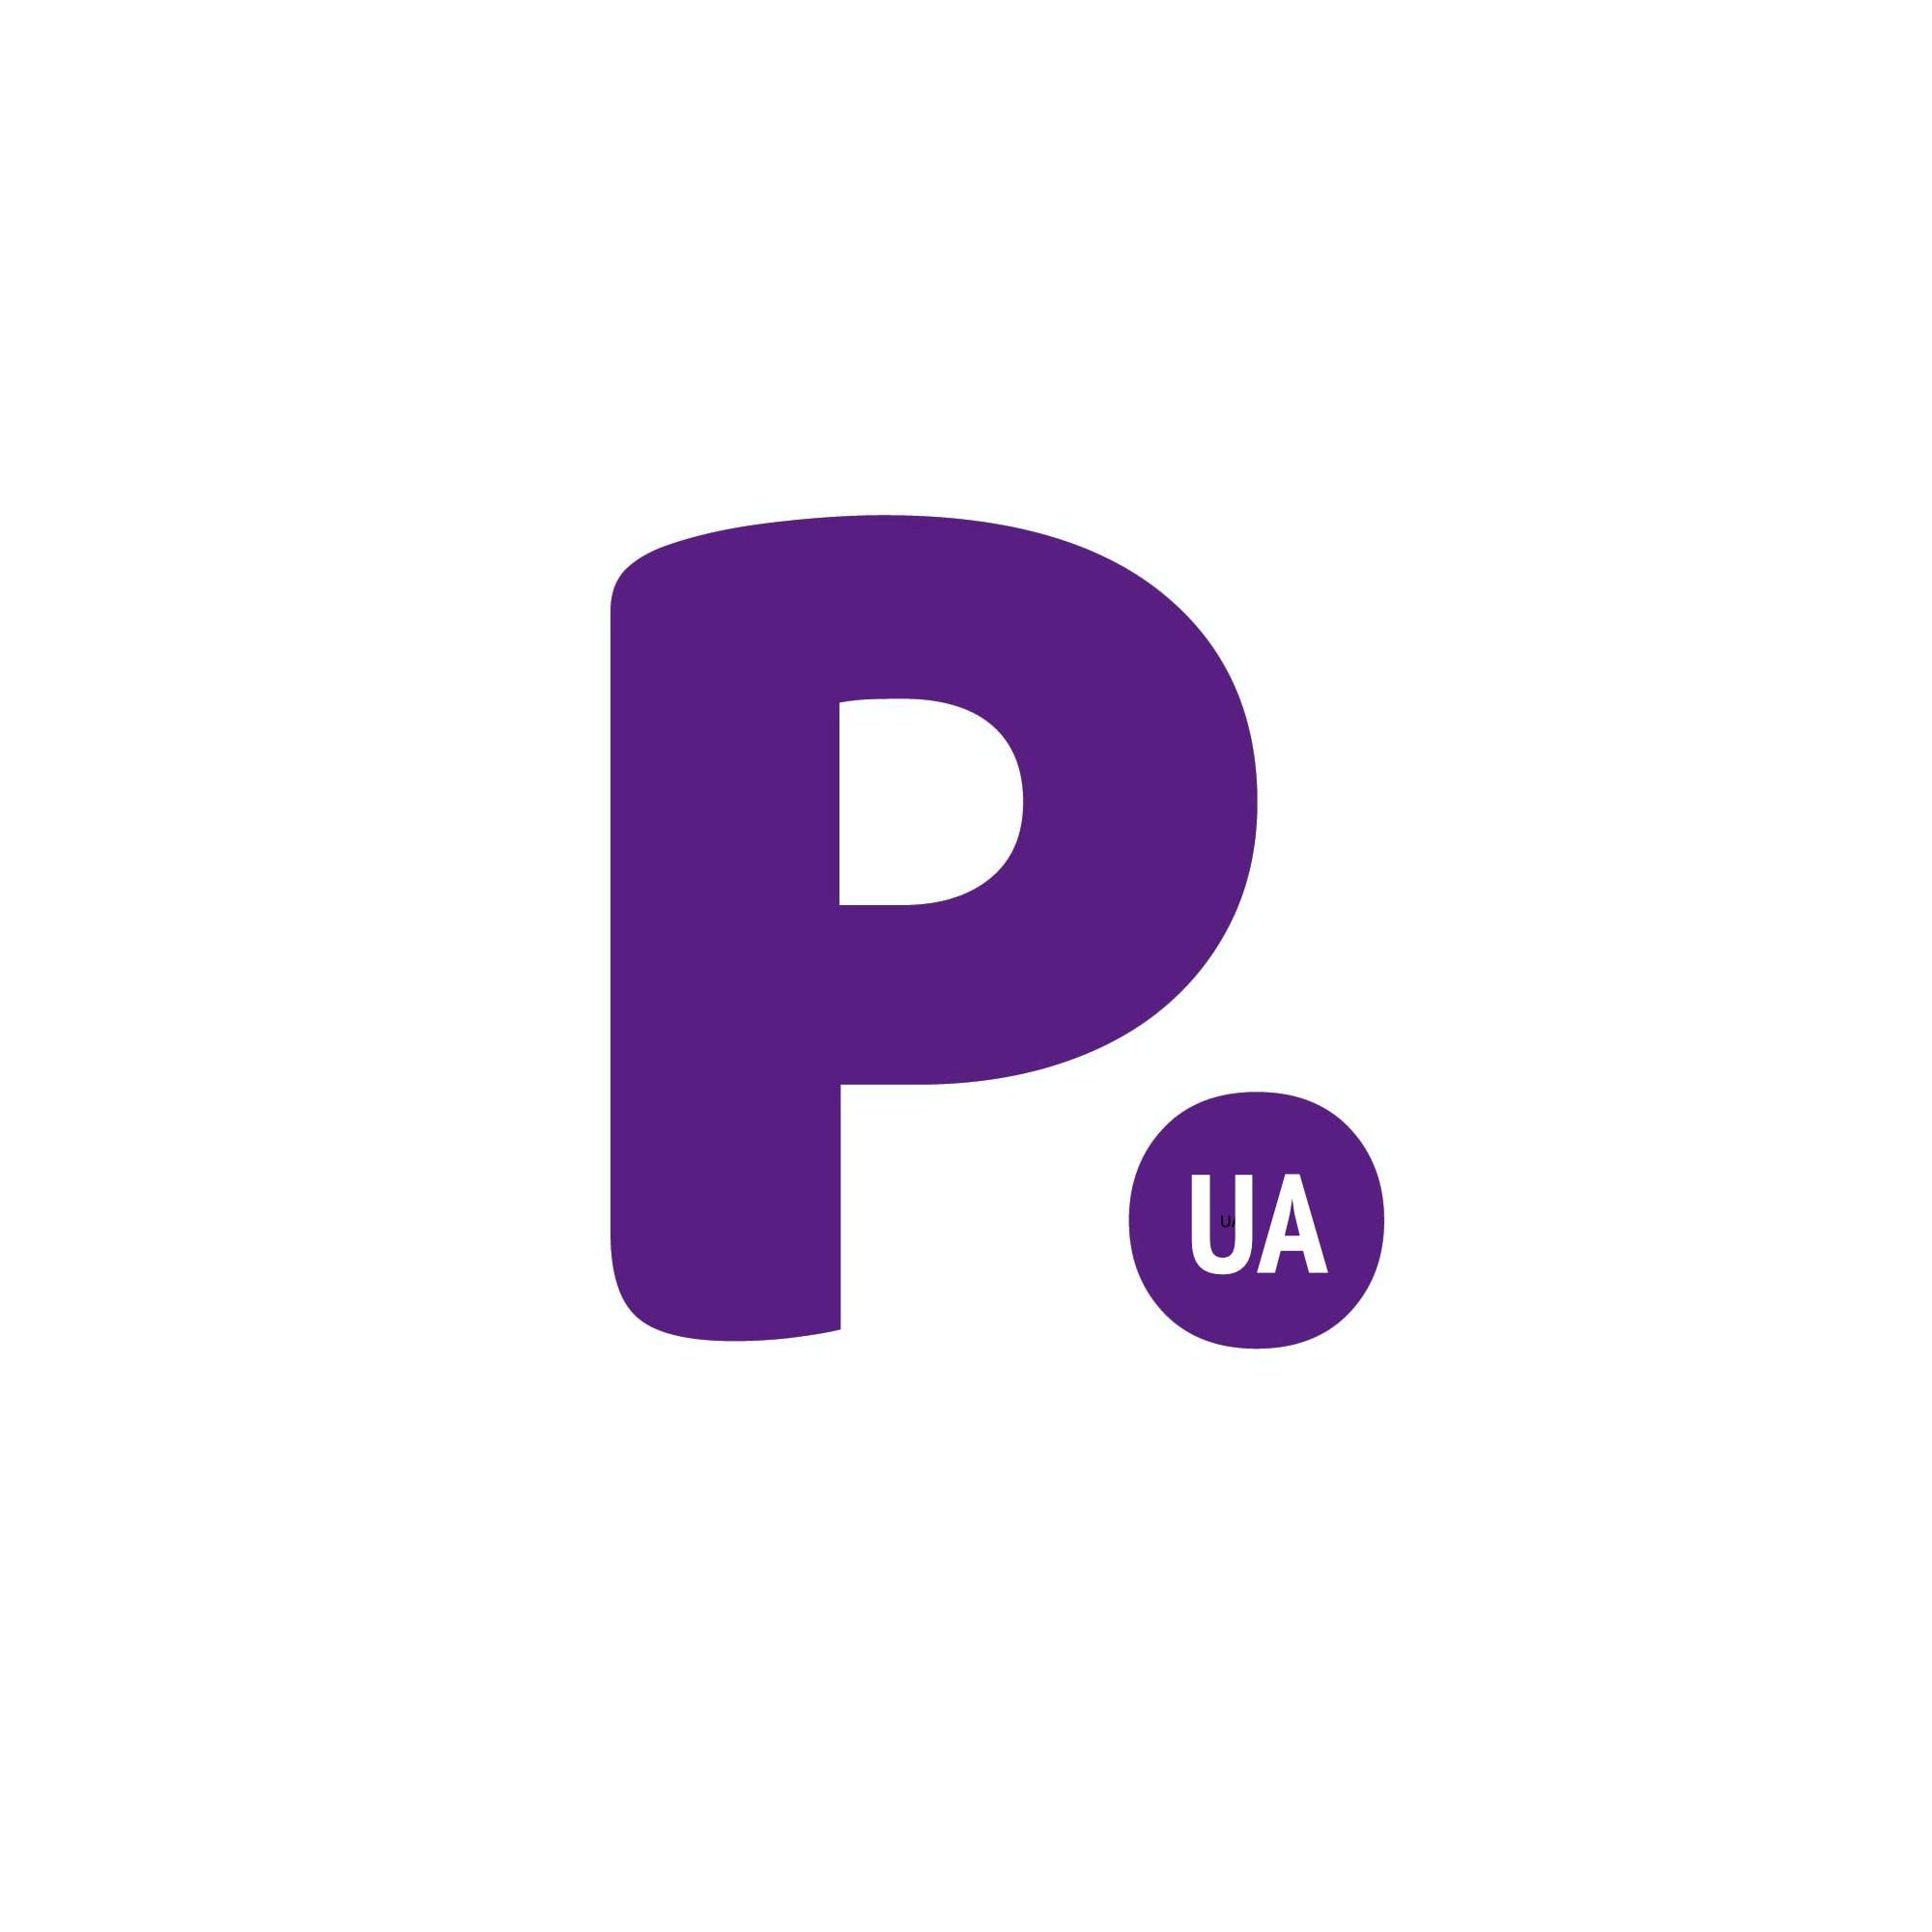 Сковорода PENSOFAL PEN8505-B 24см BIO STONE (PEN8505-B)